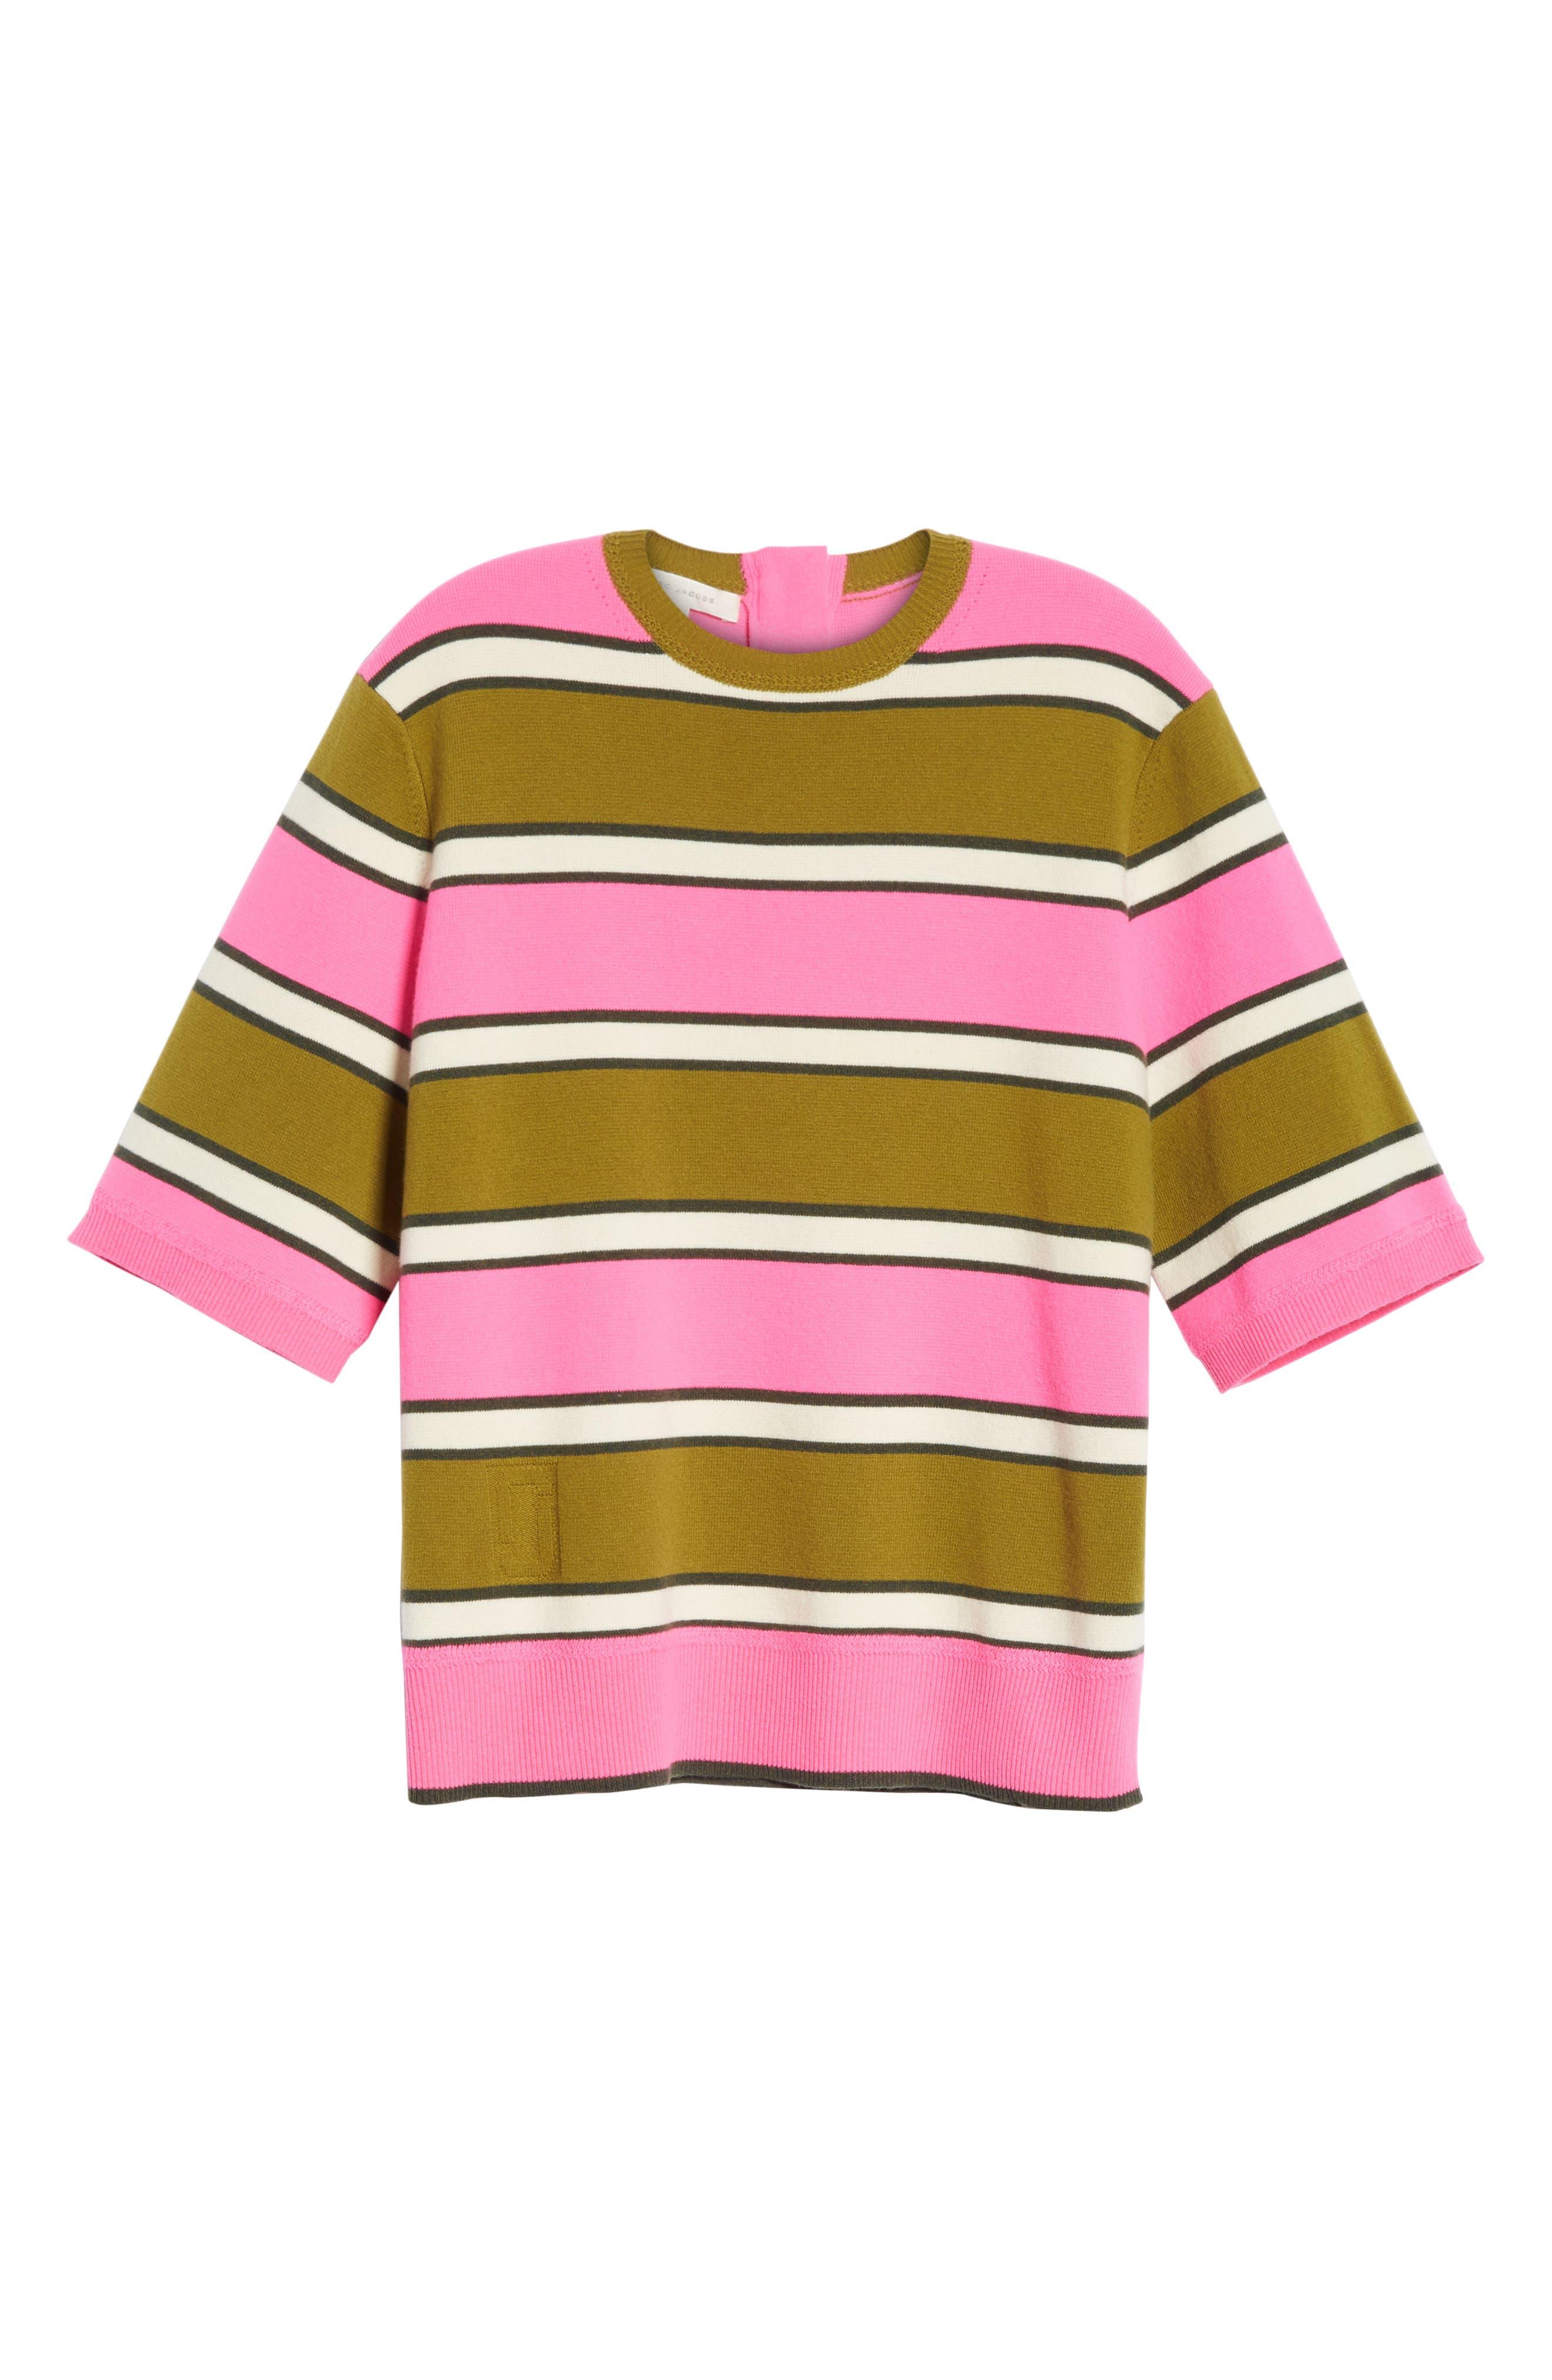 Oversize Stripe Cashmere Sweater,                             Alternate thumbnail 6, color,                             651